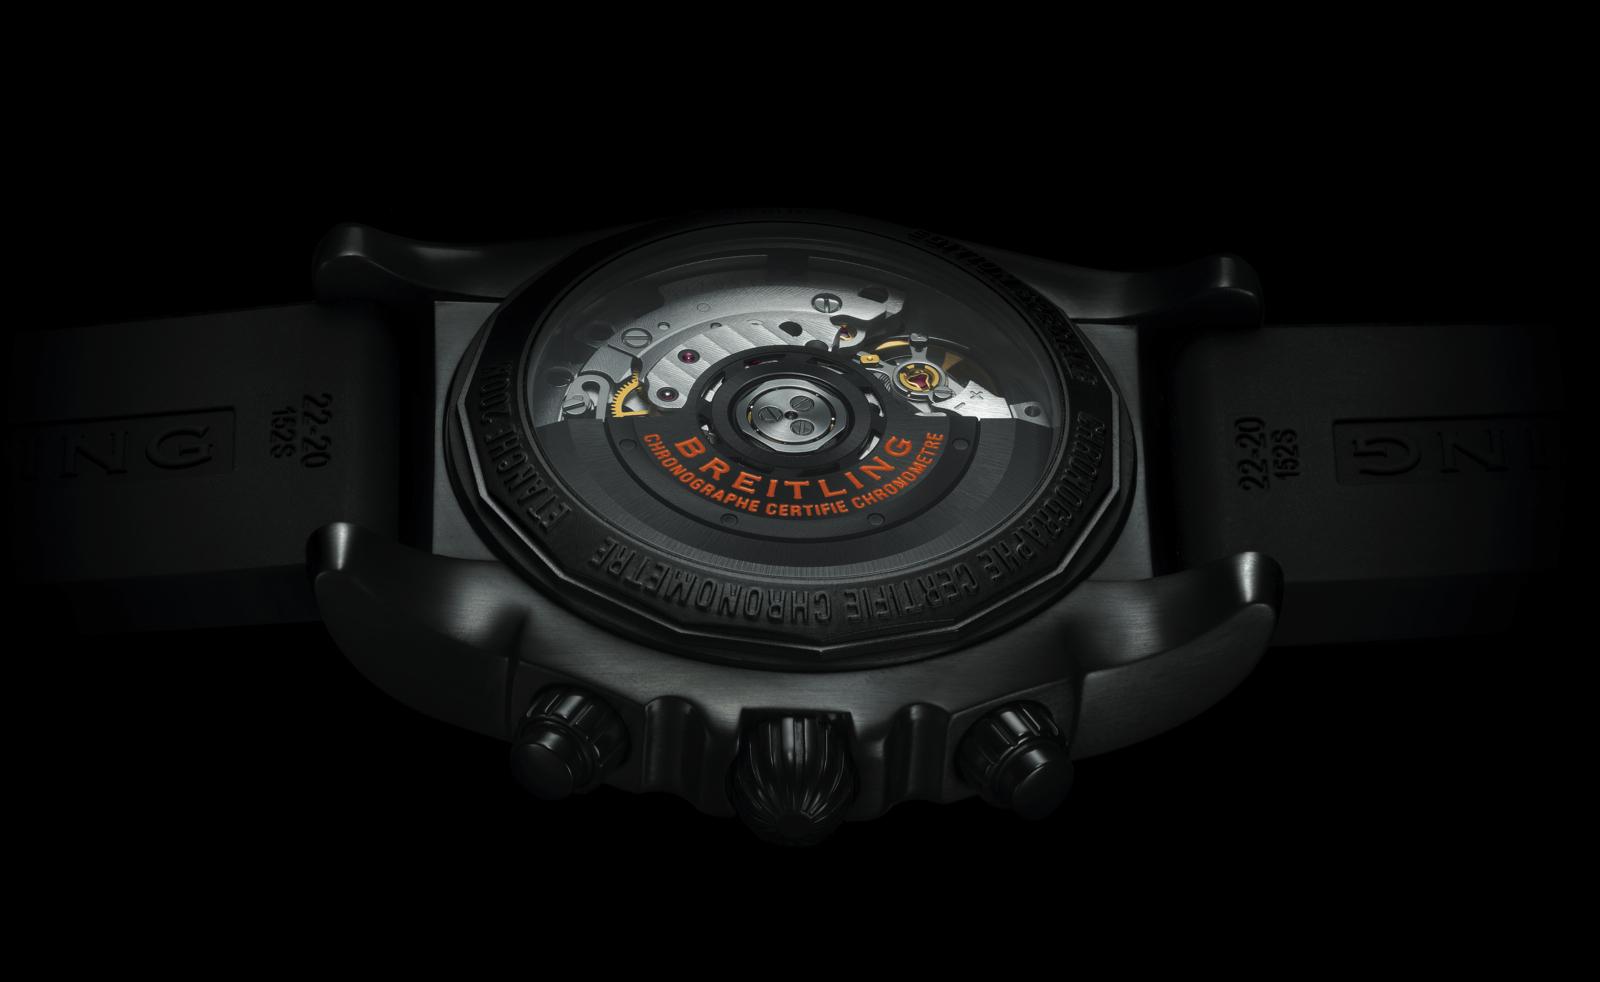 Naziv: Breitling-Chronomat-44-Raven-Caseback-watches-satovi-1.jpg, pregleda: 724, veličina: 581,3 KB